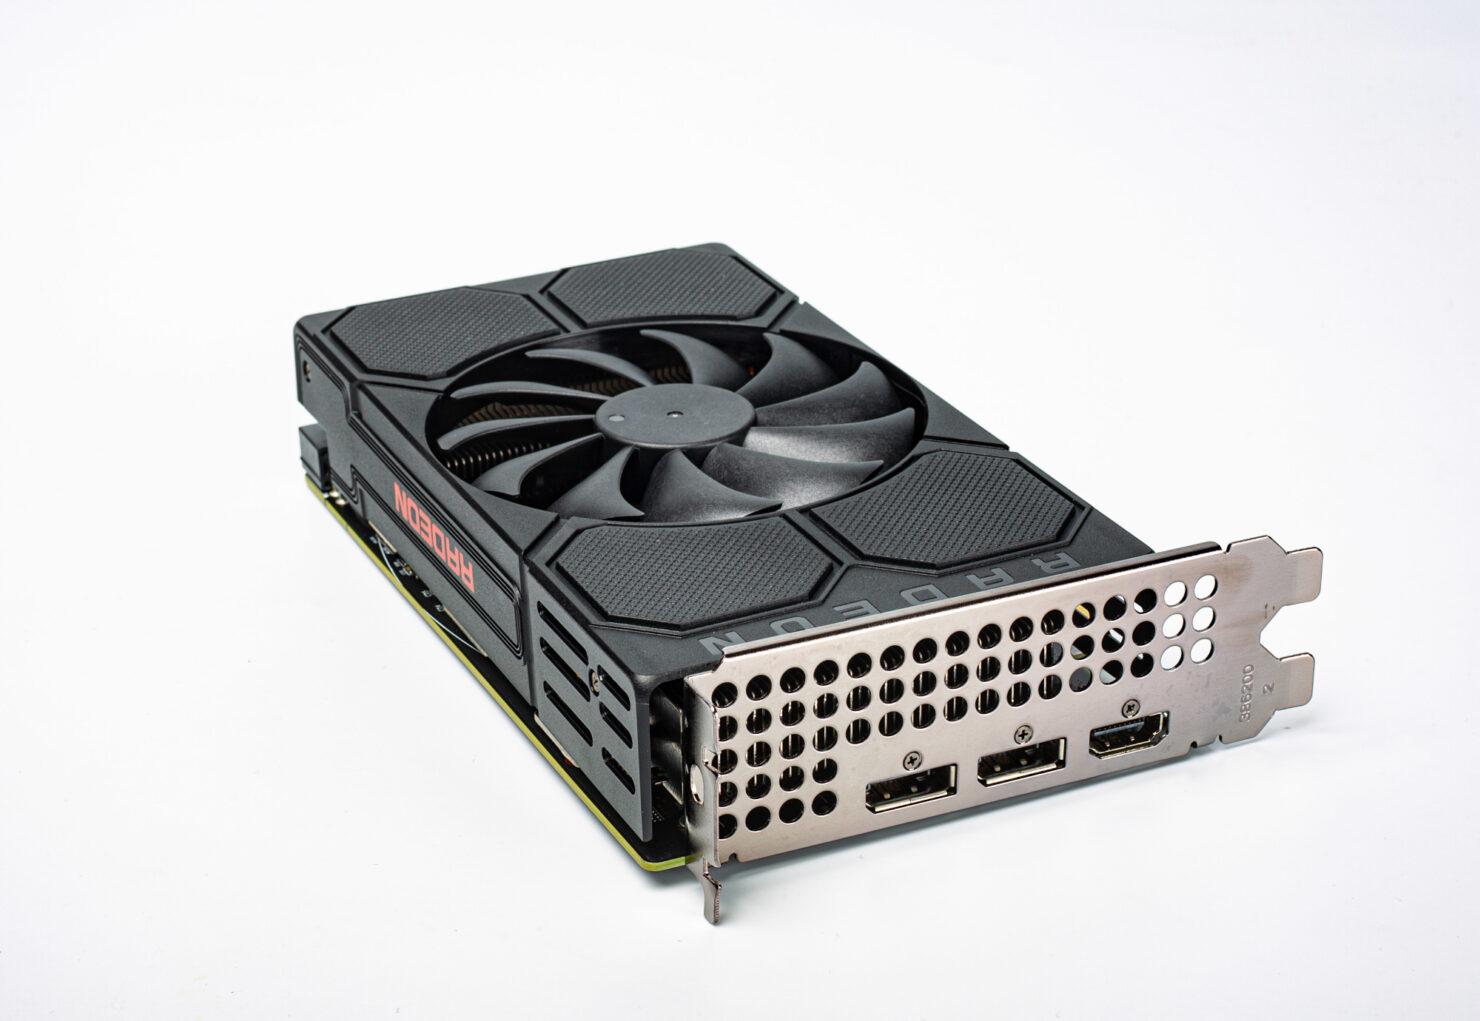 amd-radeon-rx-5500-navi-14-graphics-card-performance-benchmarks_2